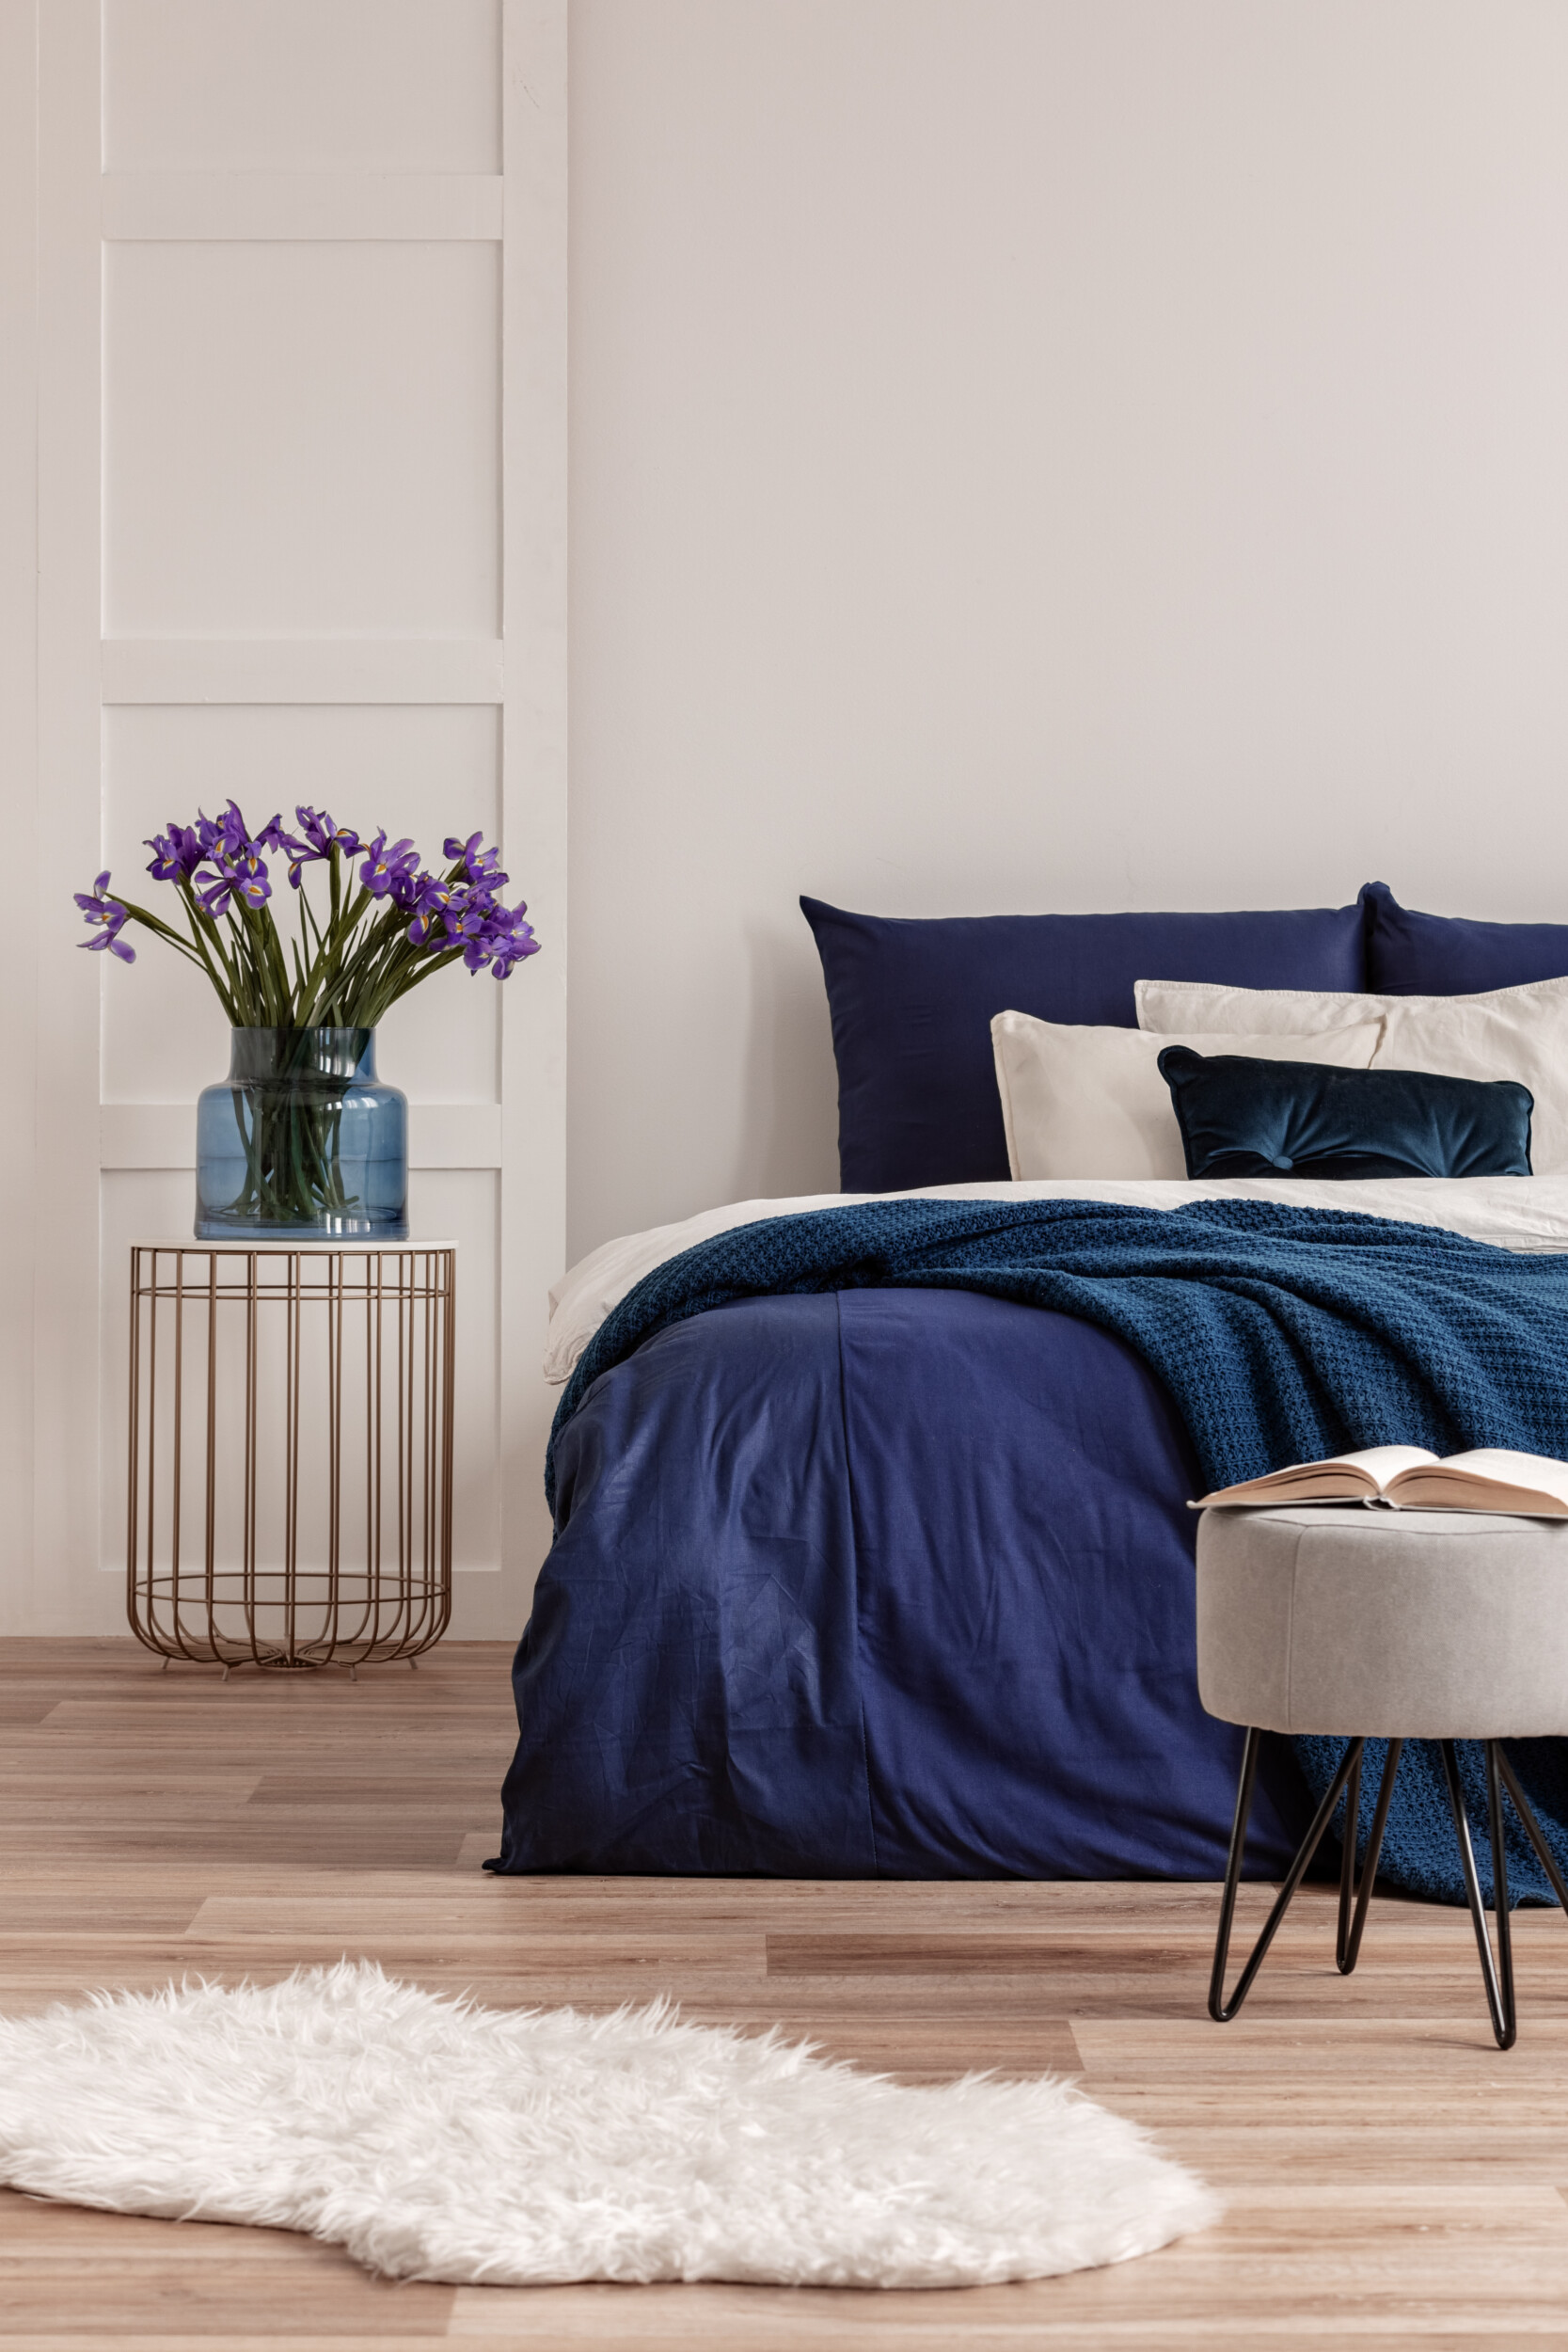 bedding idea two colors